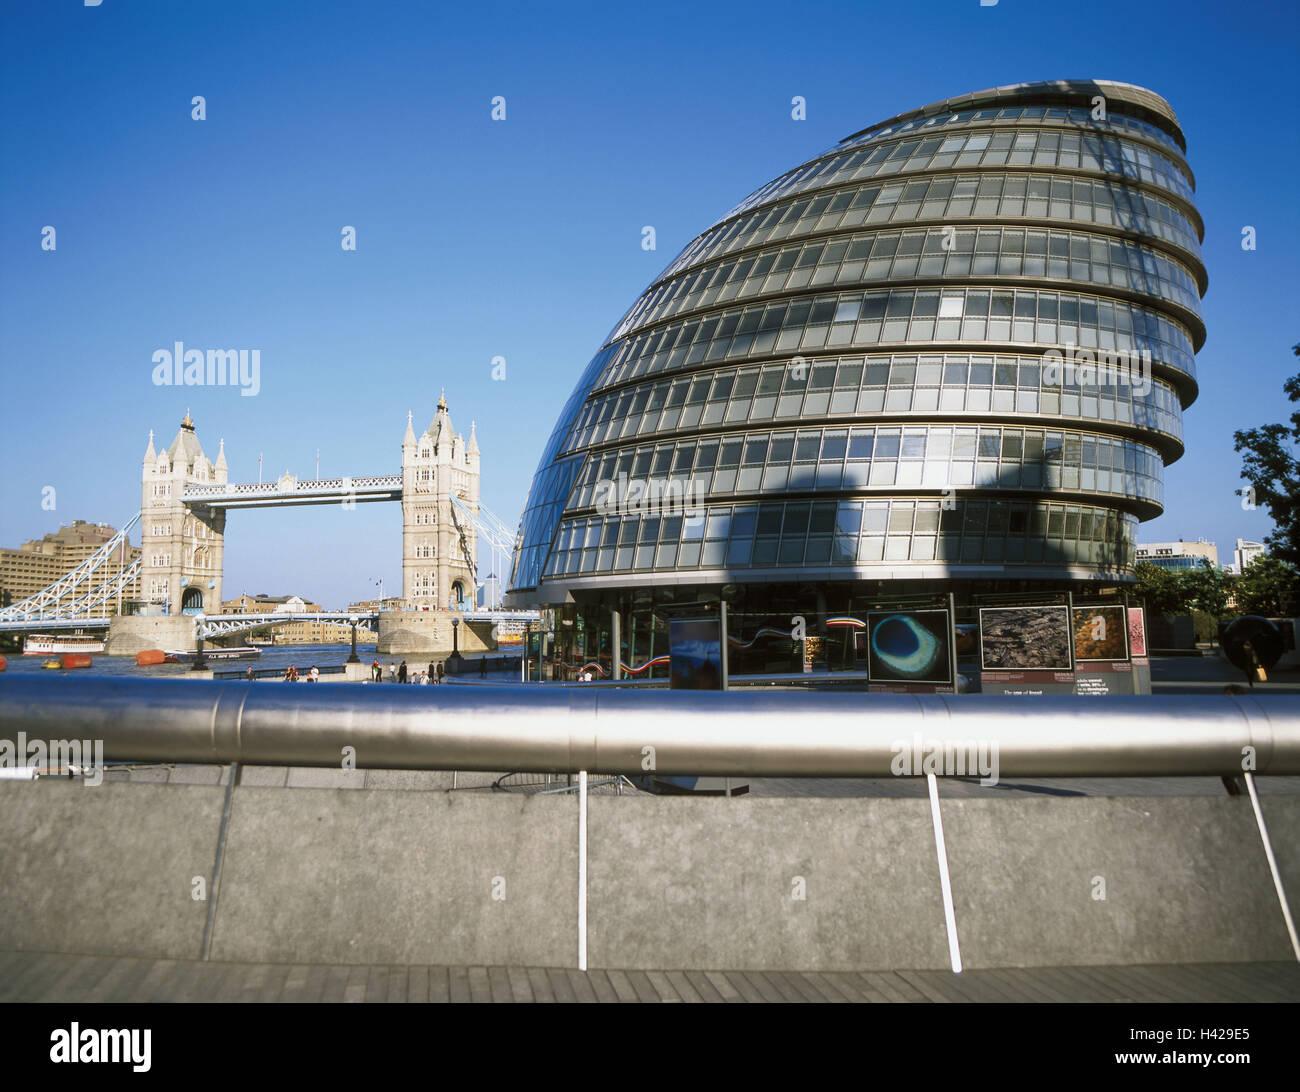 Great Britain, England, London, Tower Bridge, city sound, Europe, capital, destination, place of interest, landmark, - Stock Image